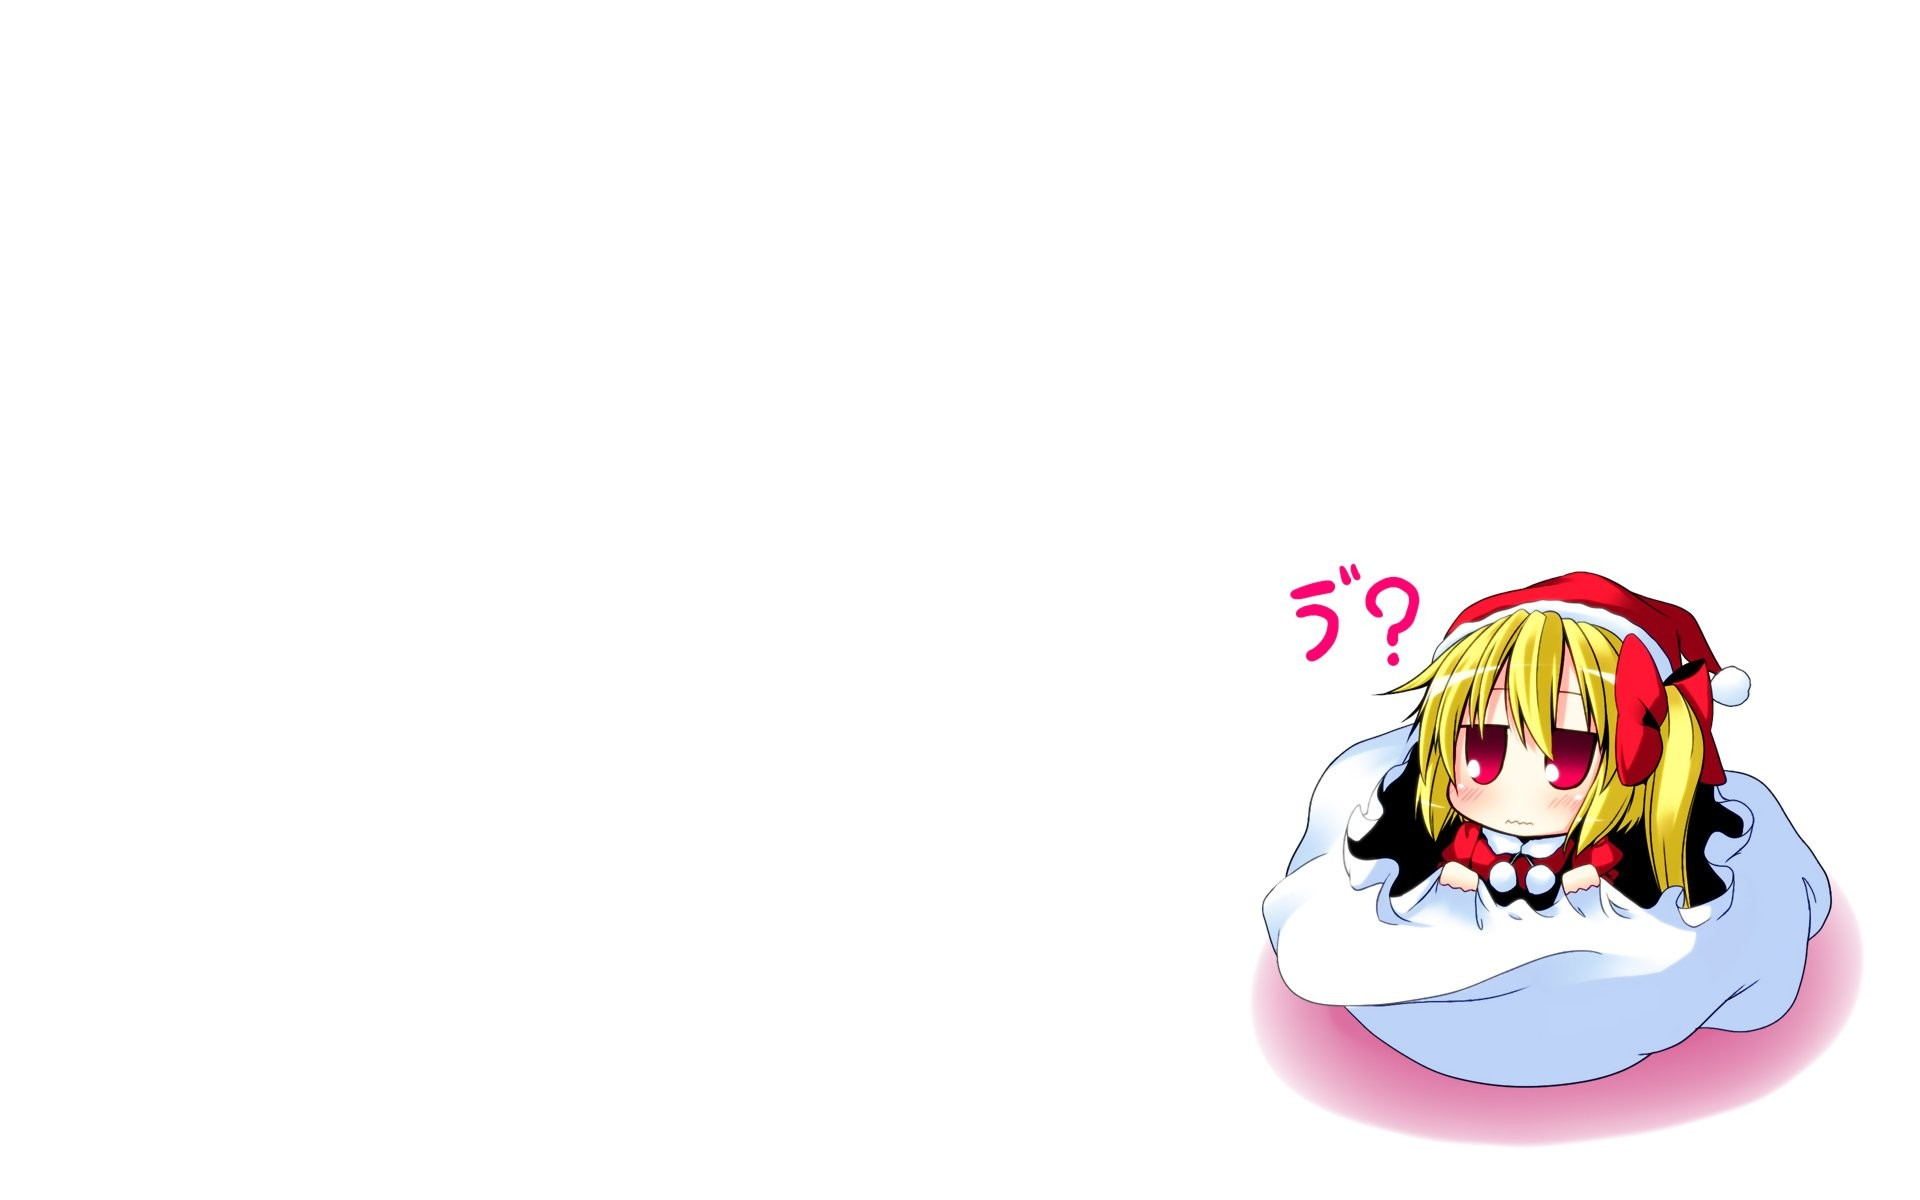 Anime chibi wallpaper wallpapertag - Chibi wallpaper hd ...